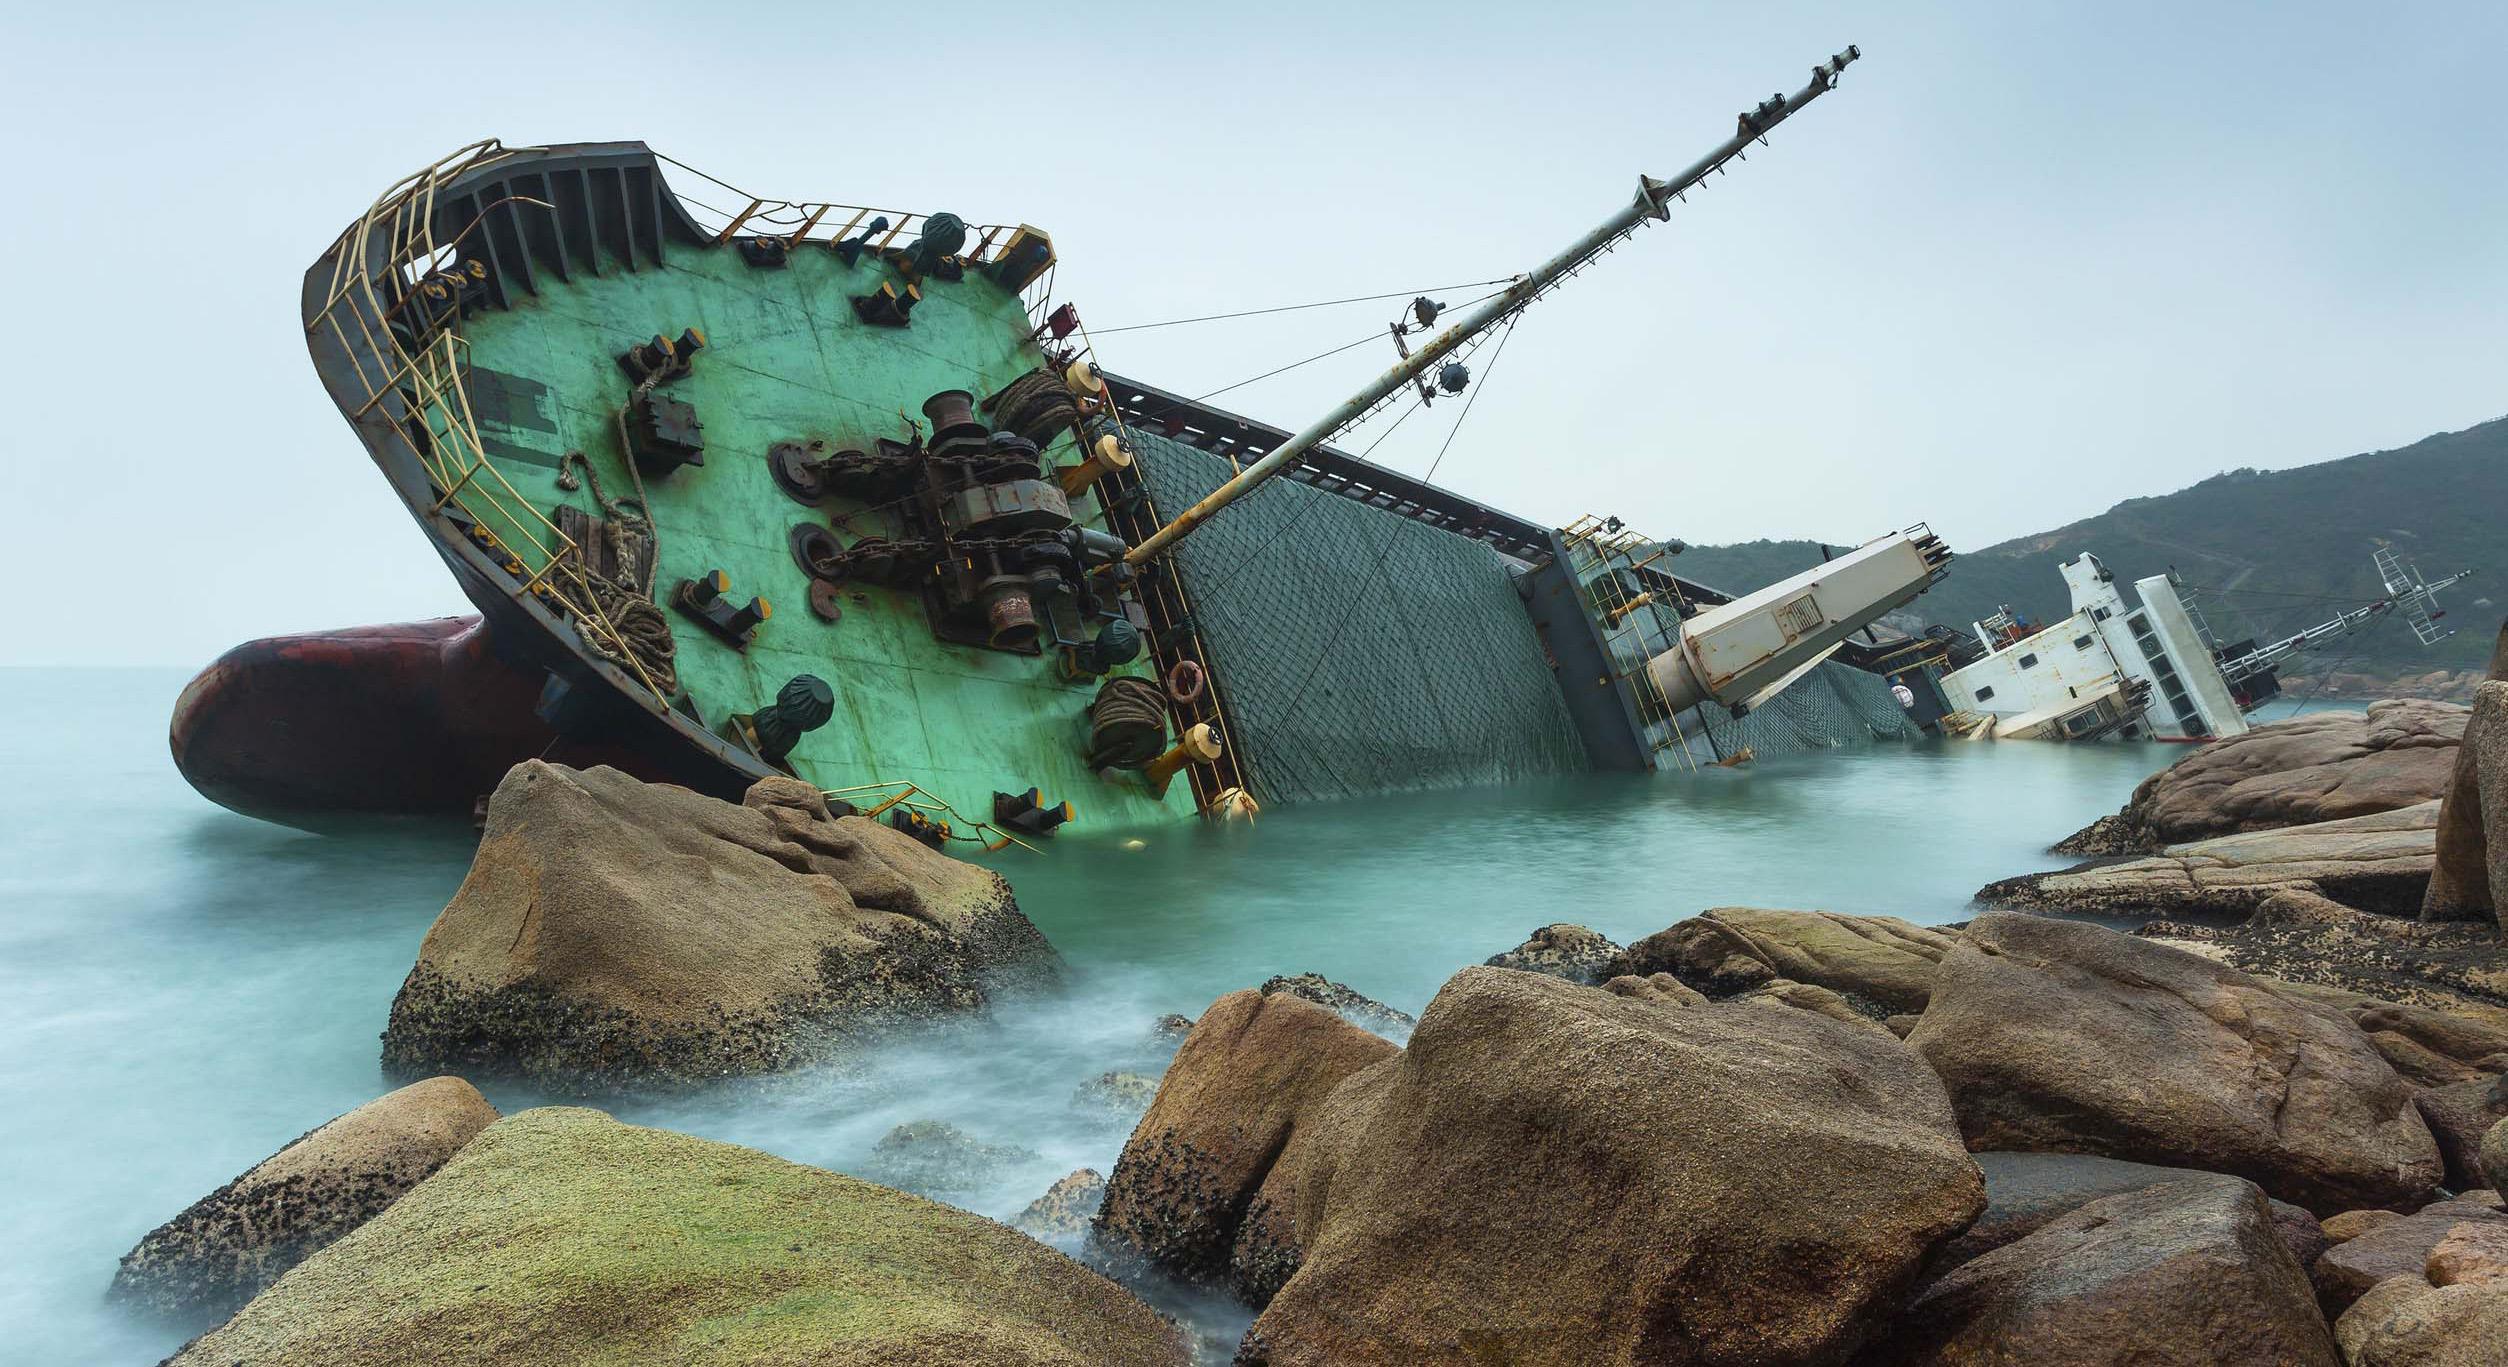 ship-aground_wartsila-shaft-line-repair-services